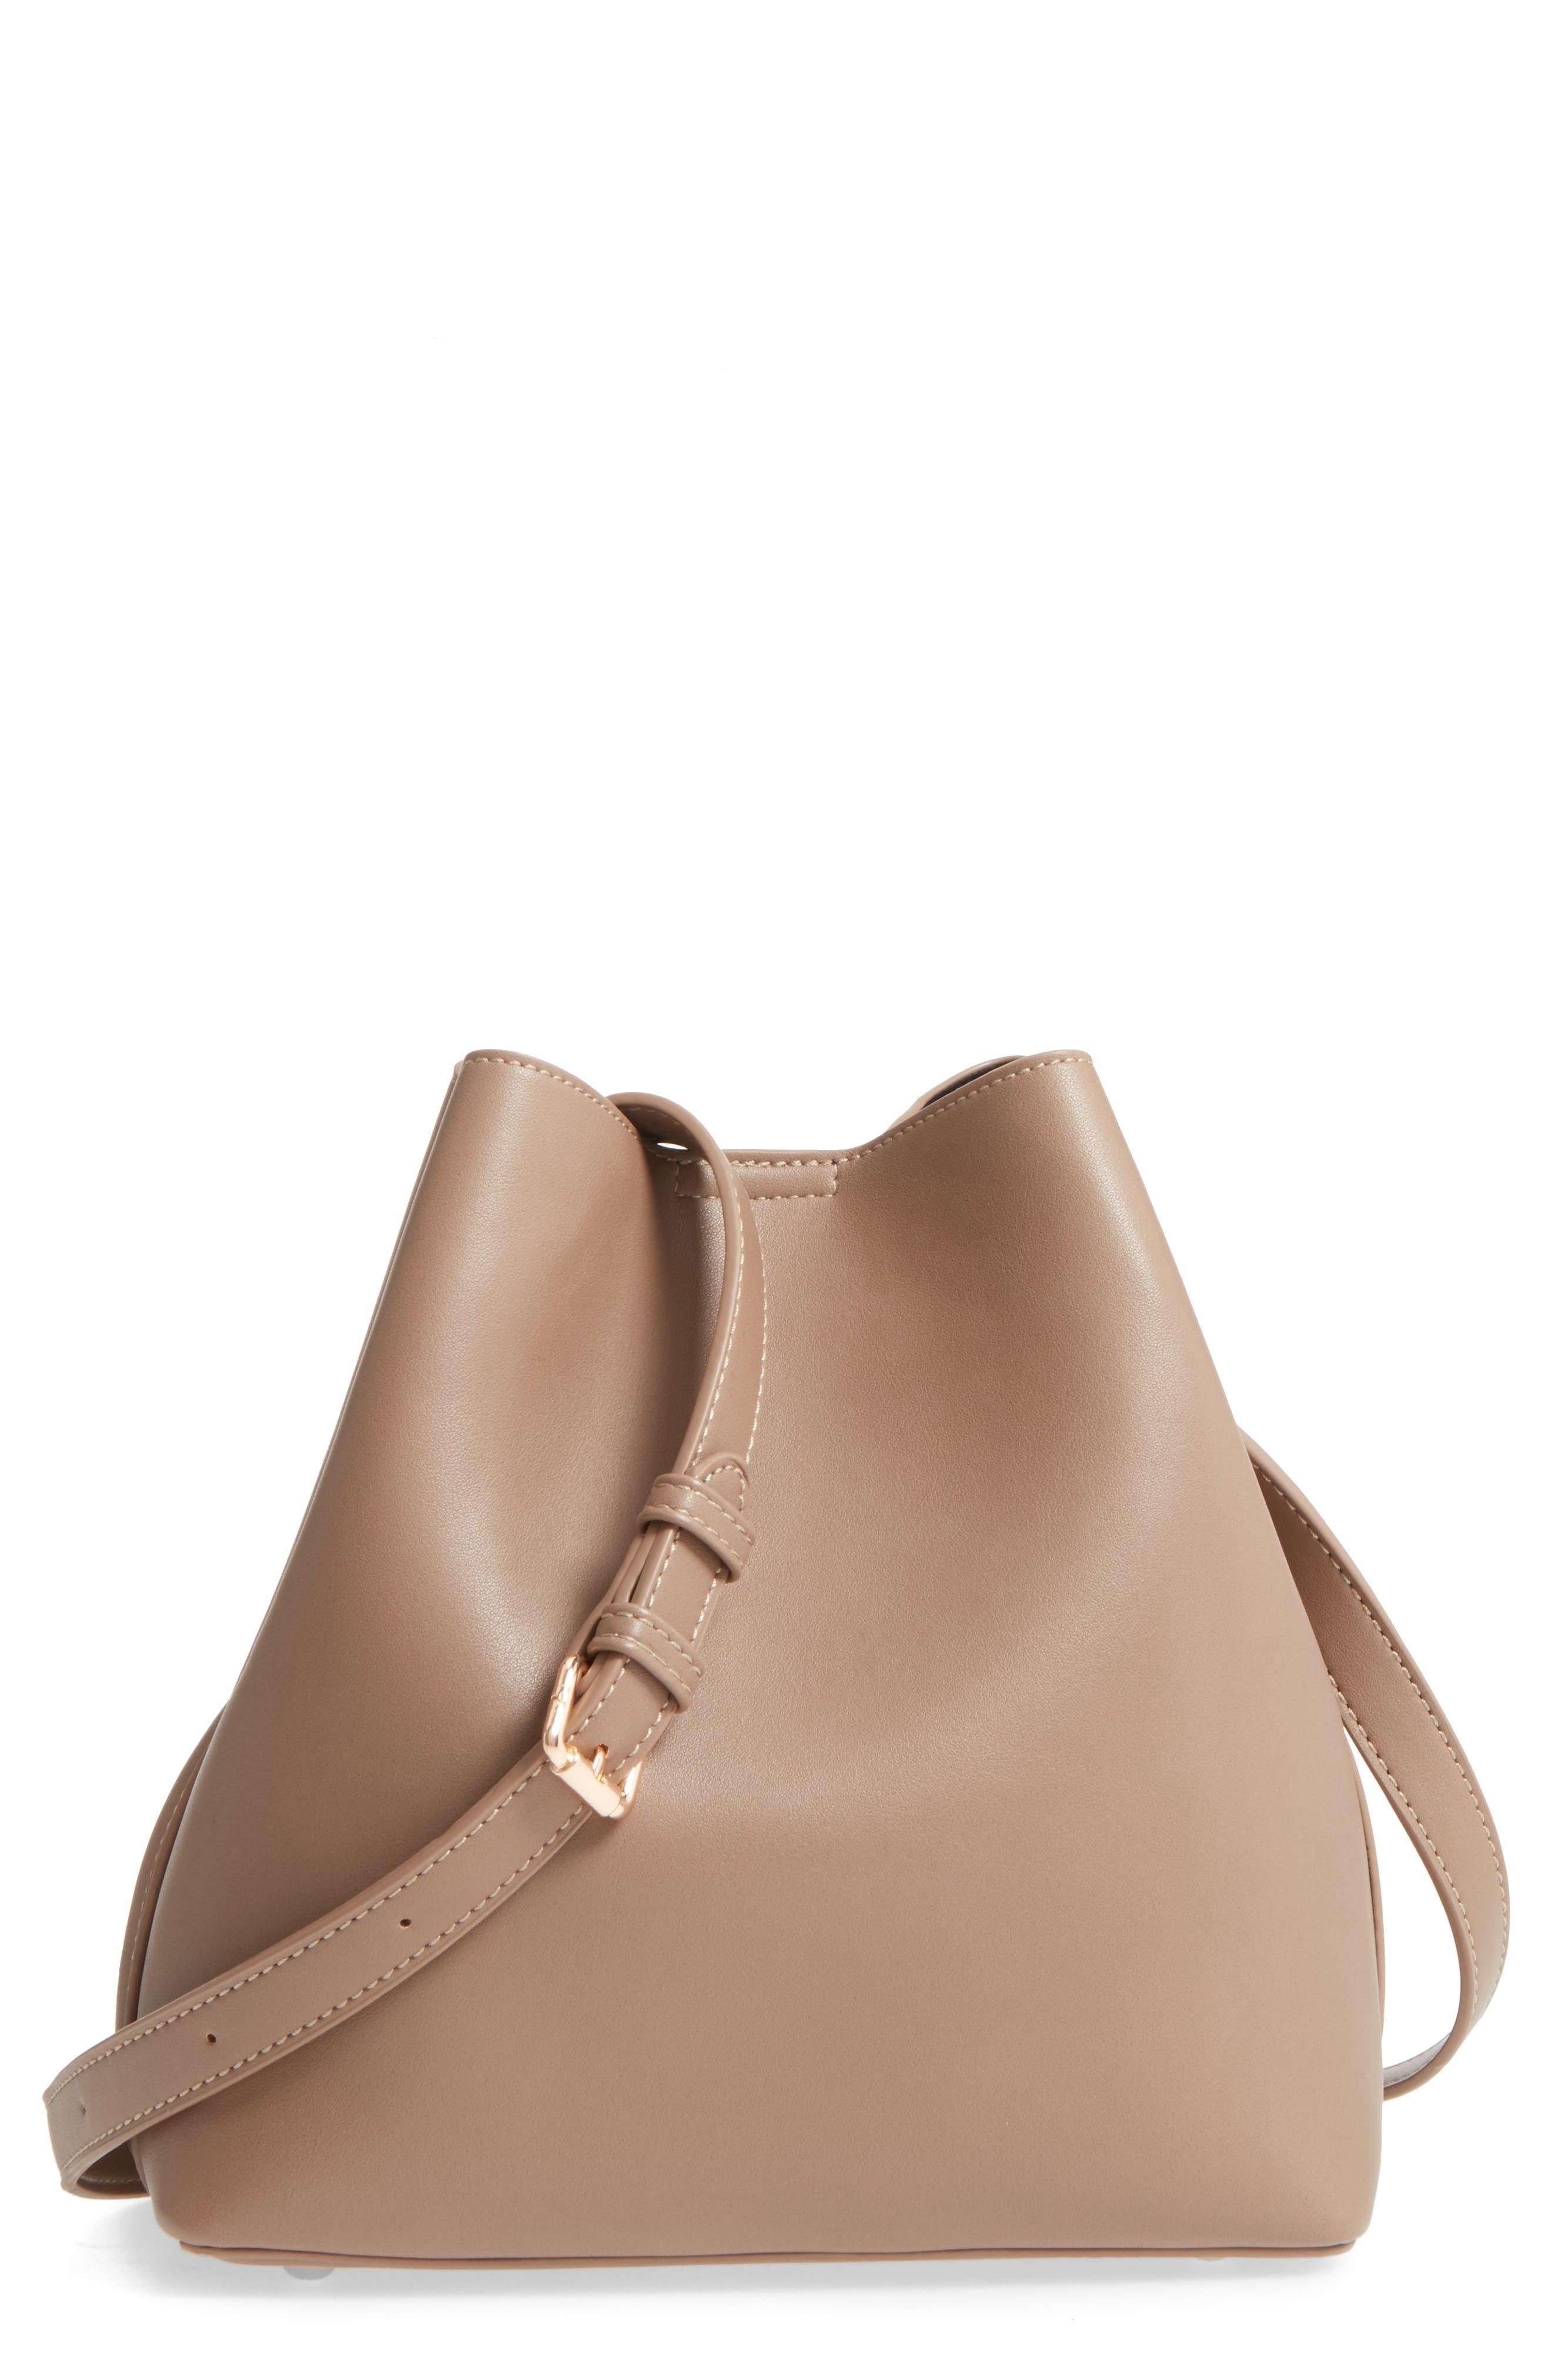 Noni Crossbody Bag,                         Main,                         color, Taupe